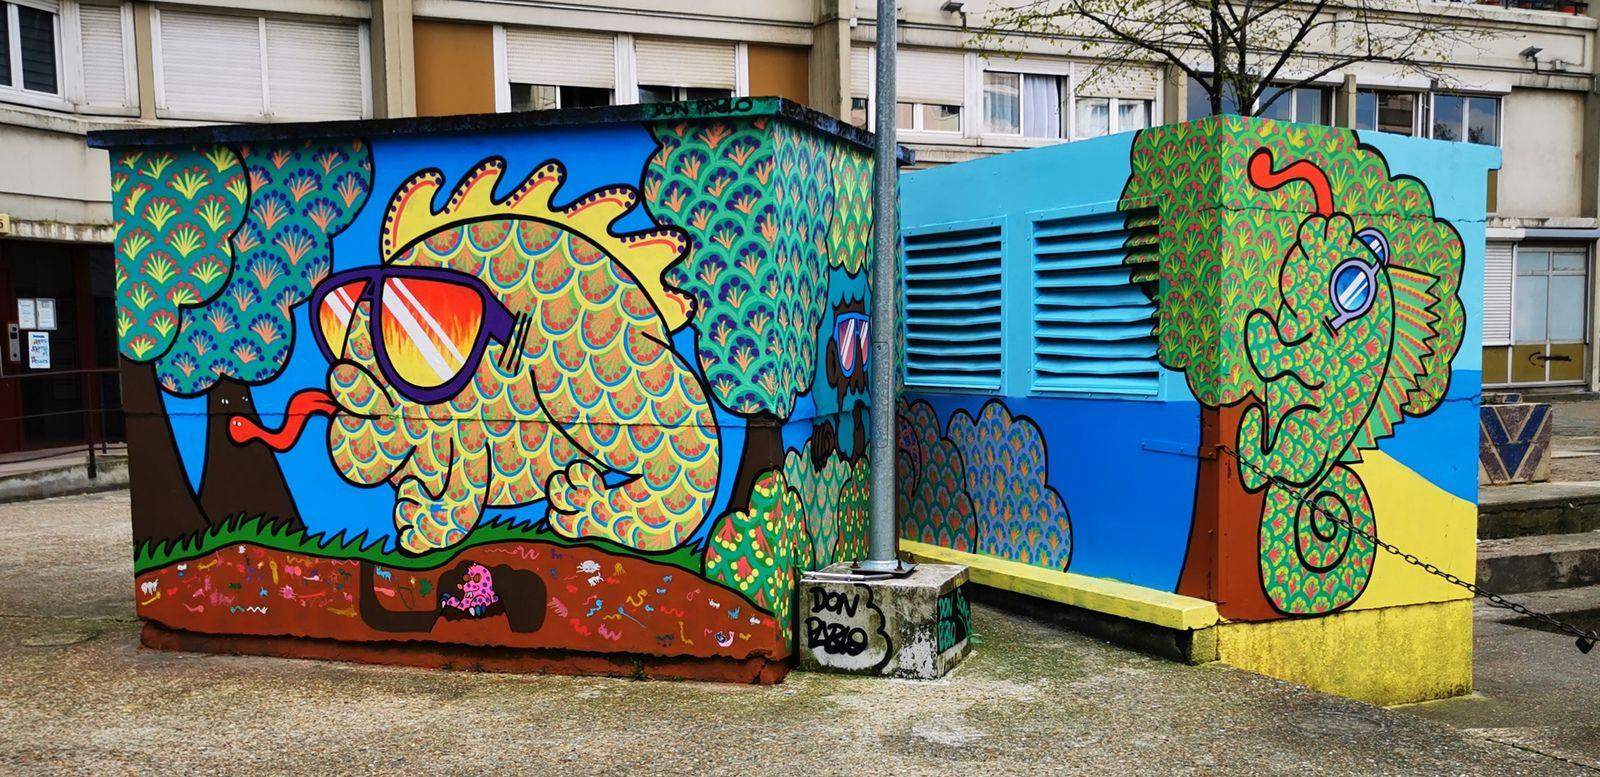 Street art: Le 27 à Pantin